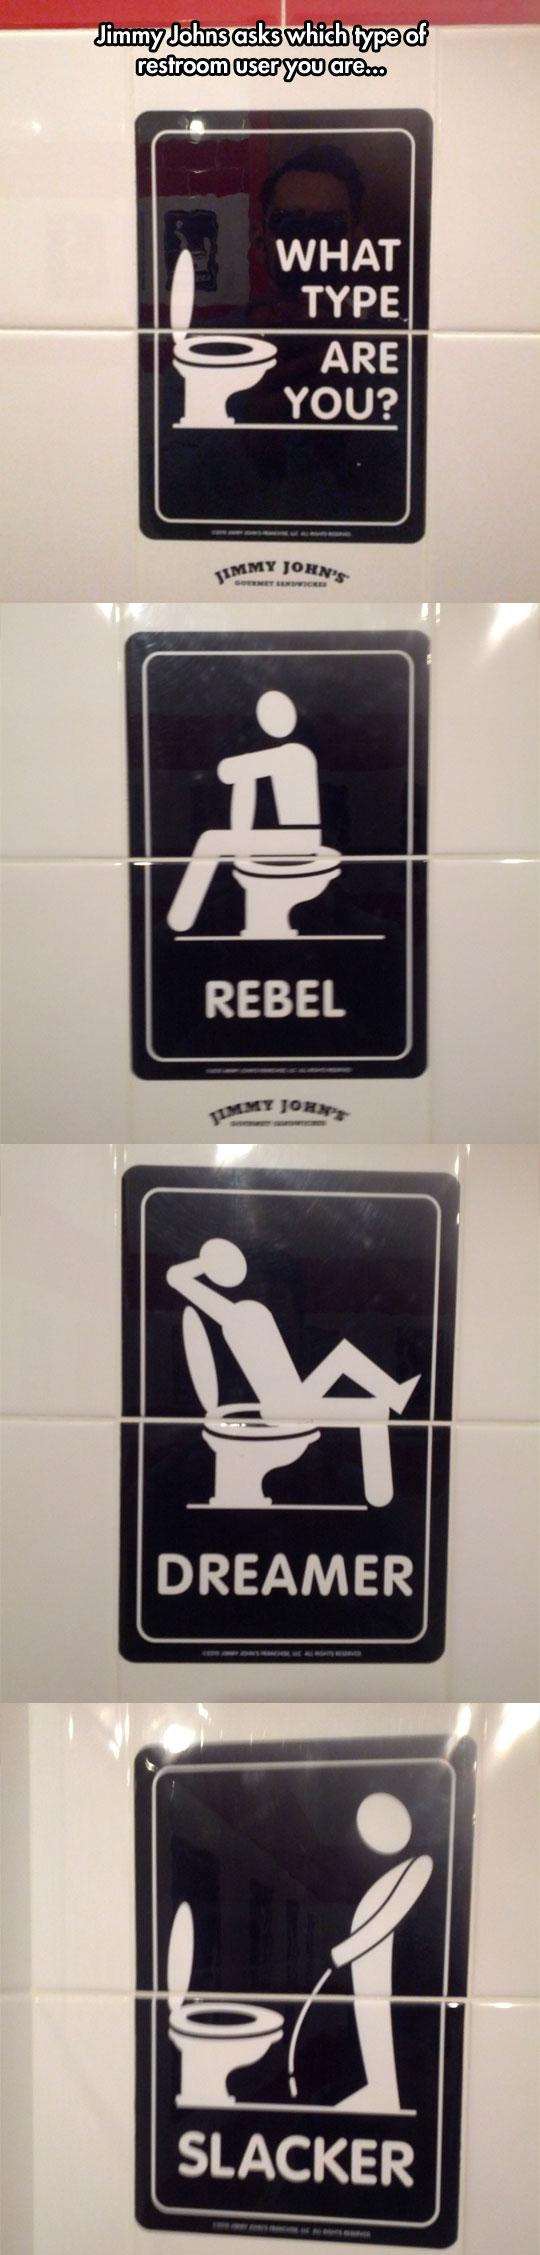 funny-bathroom-tiles-type-user